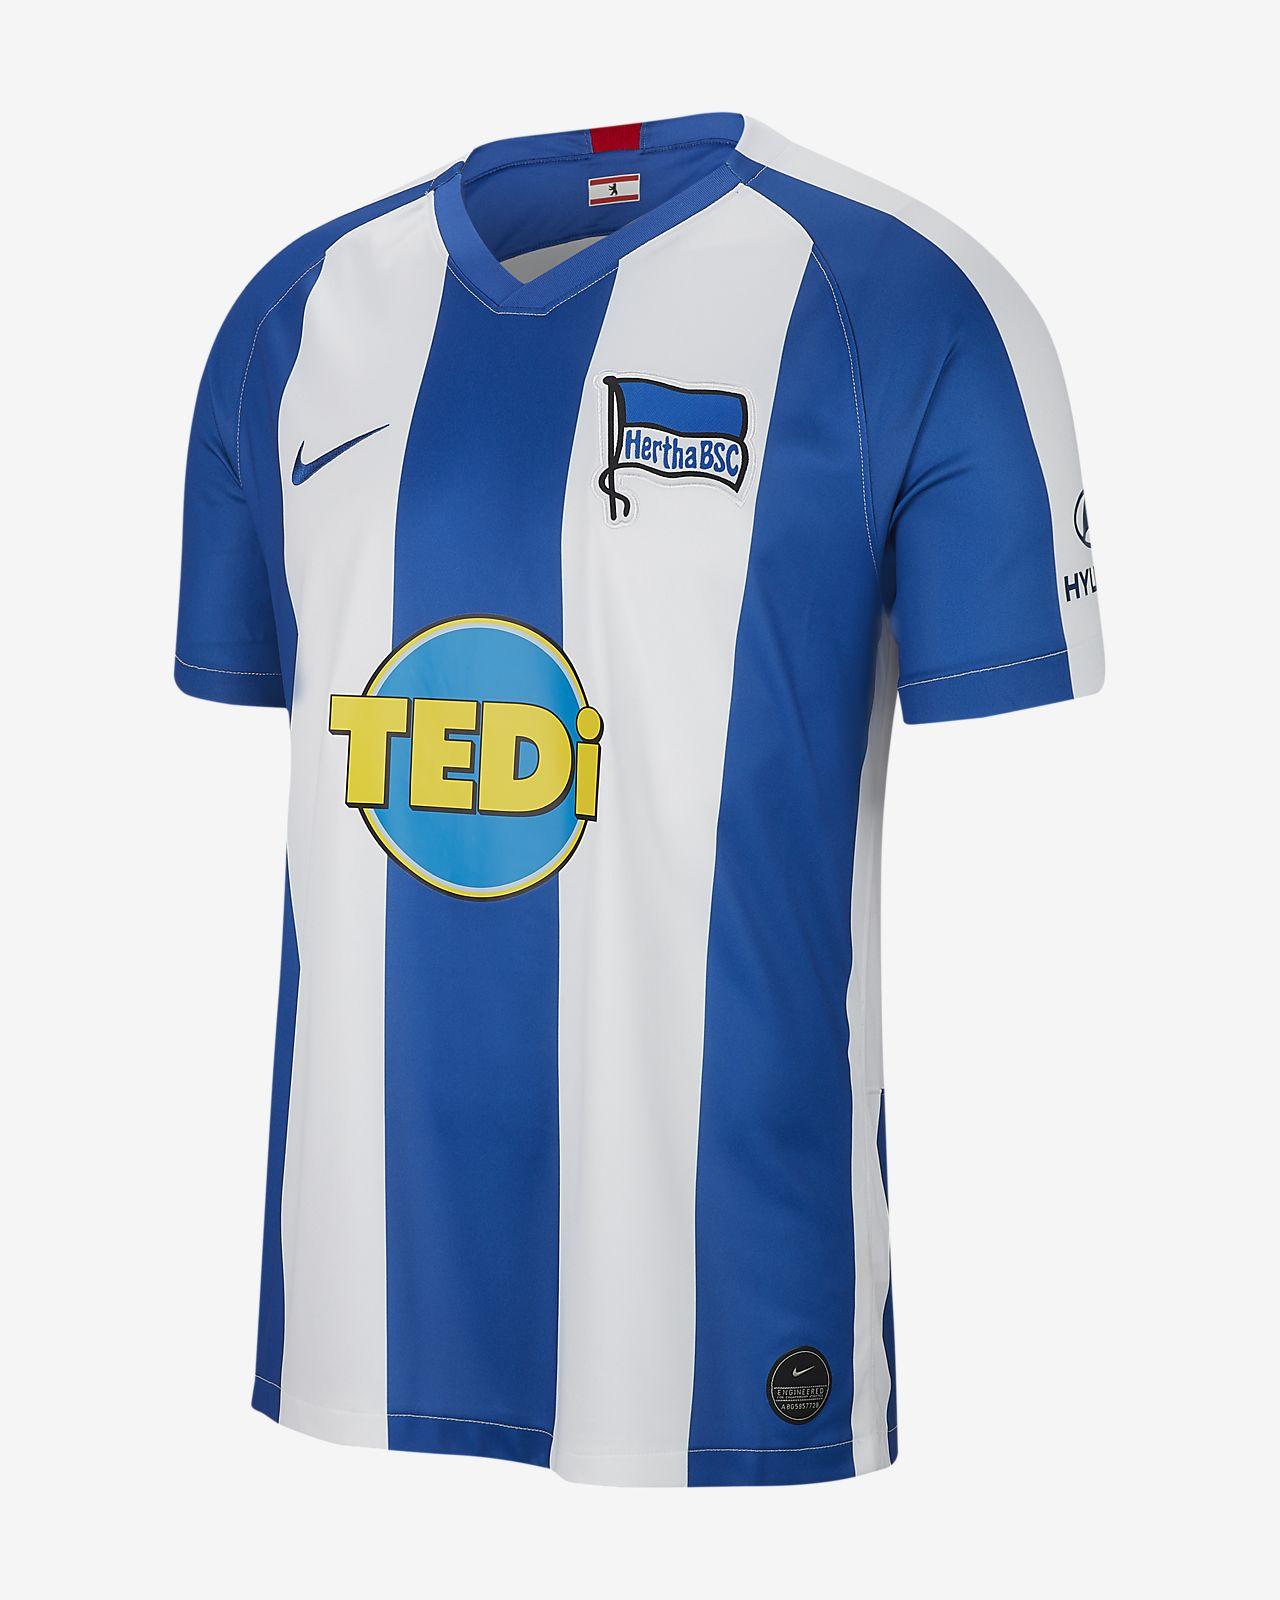 Camiseta de fútbol de local para hombre Stadium del Hertha BSC 2019/20